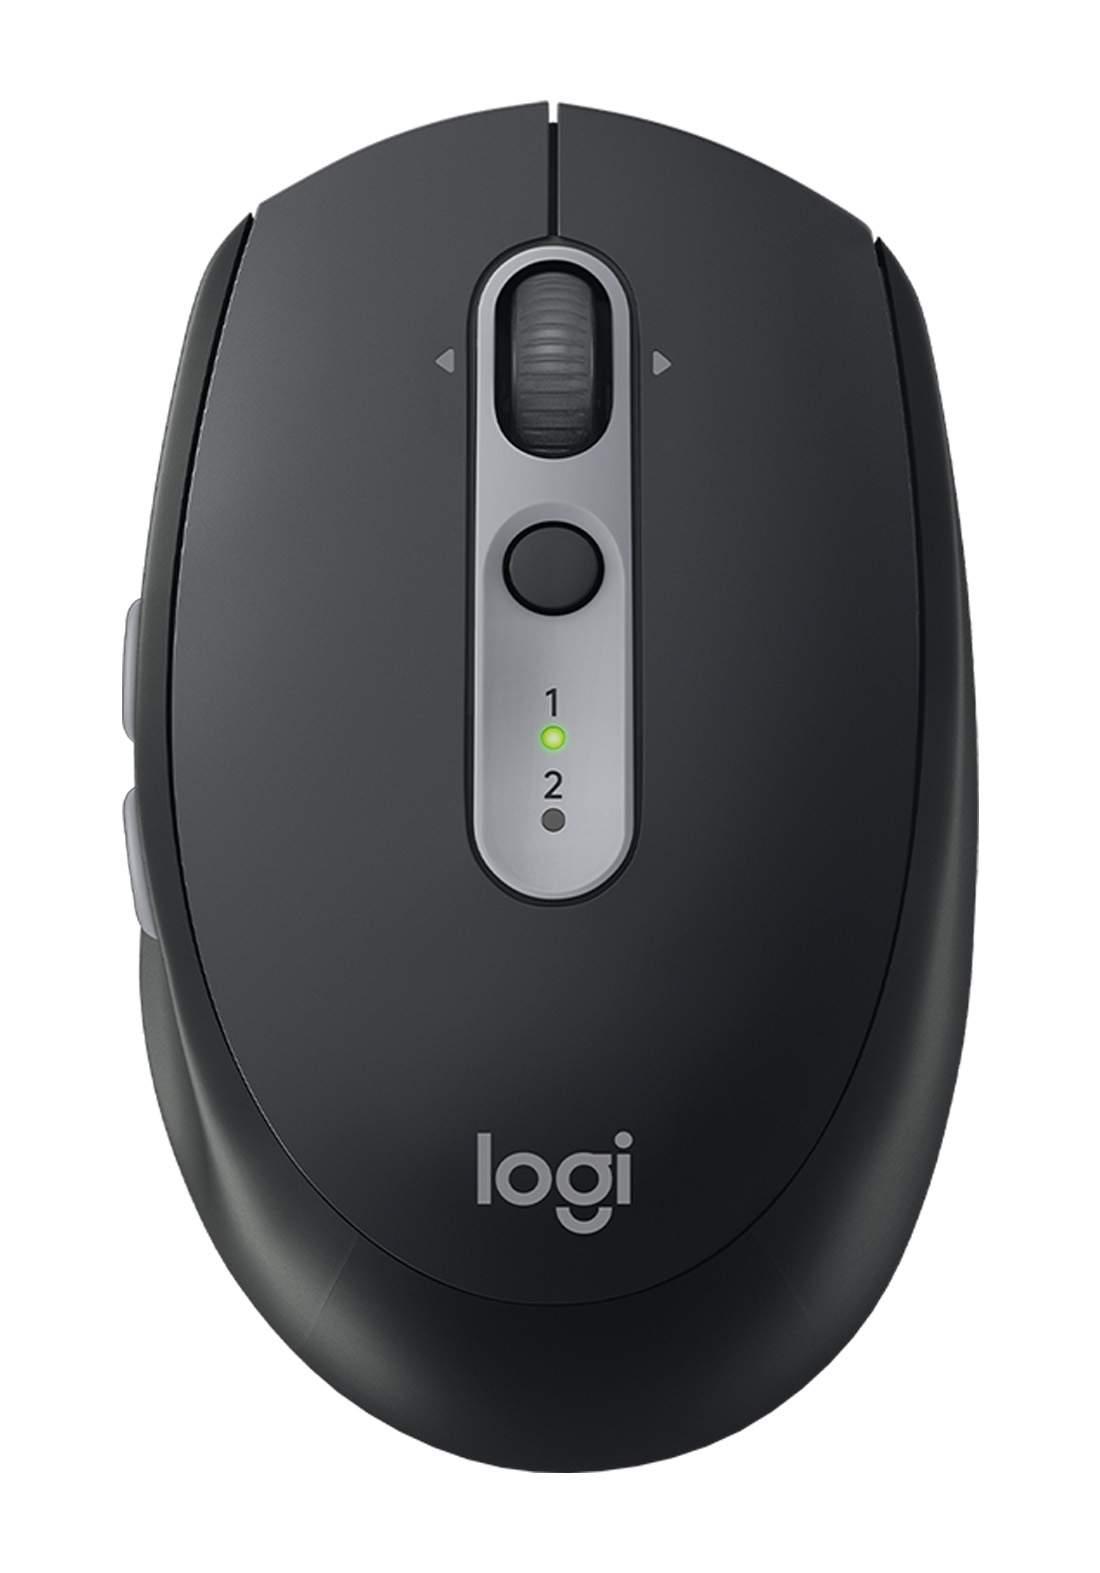 Logitech M590 Wireless Mouse - Black ماوس